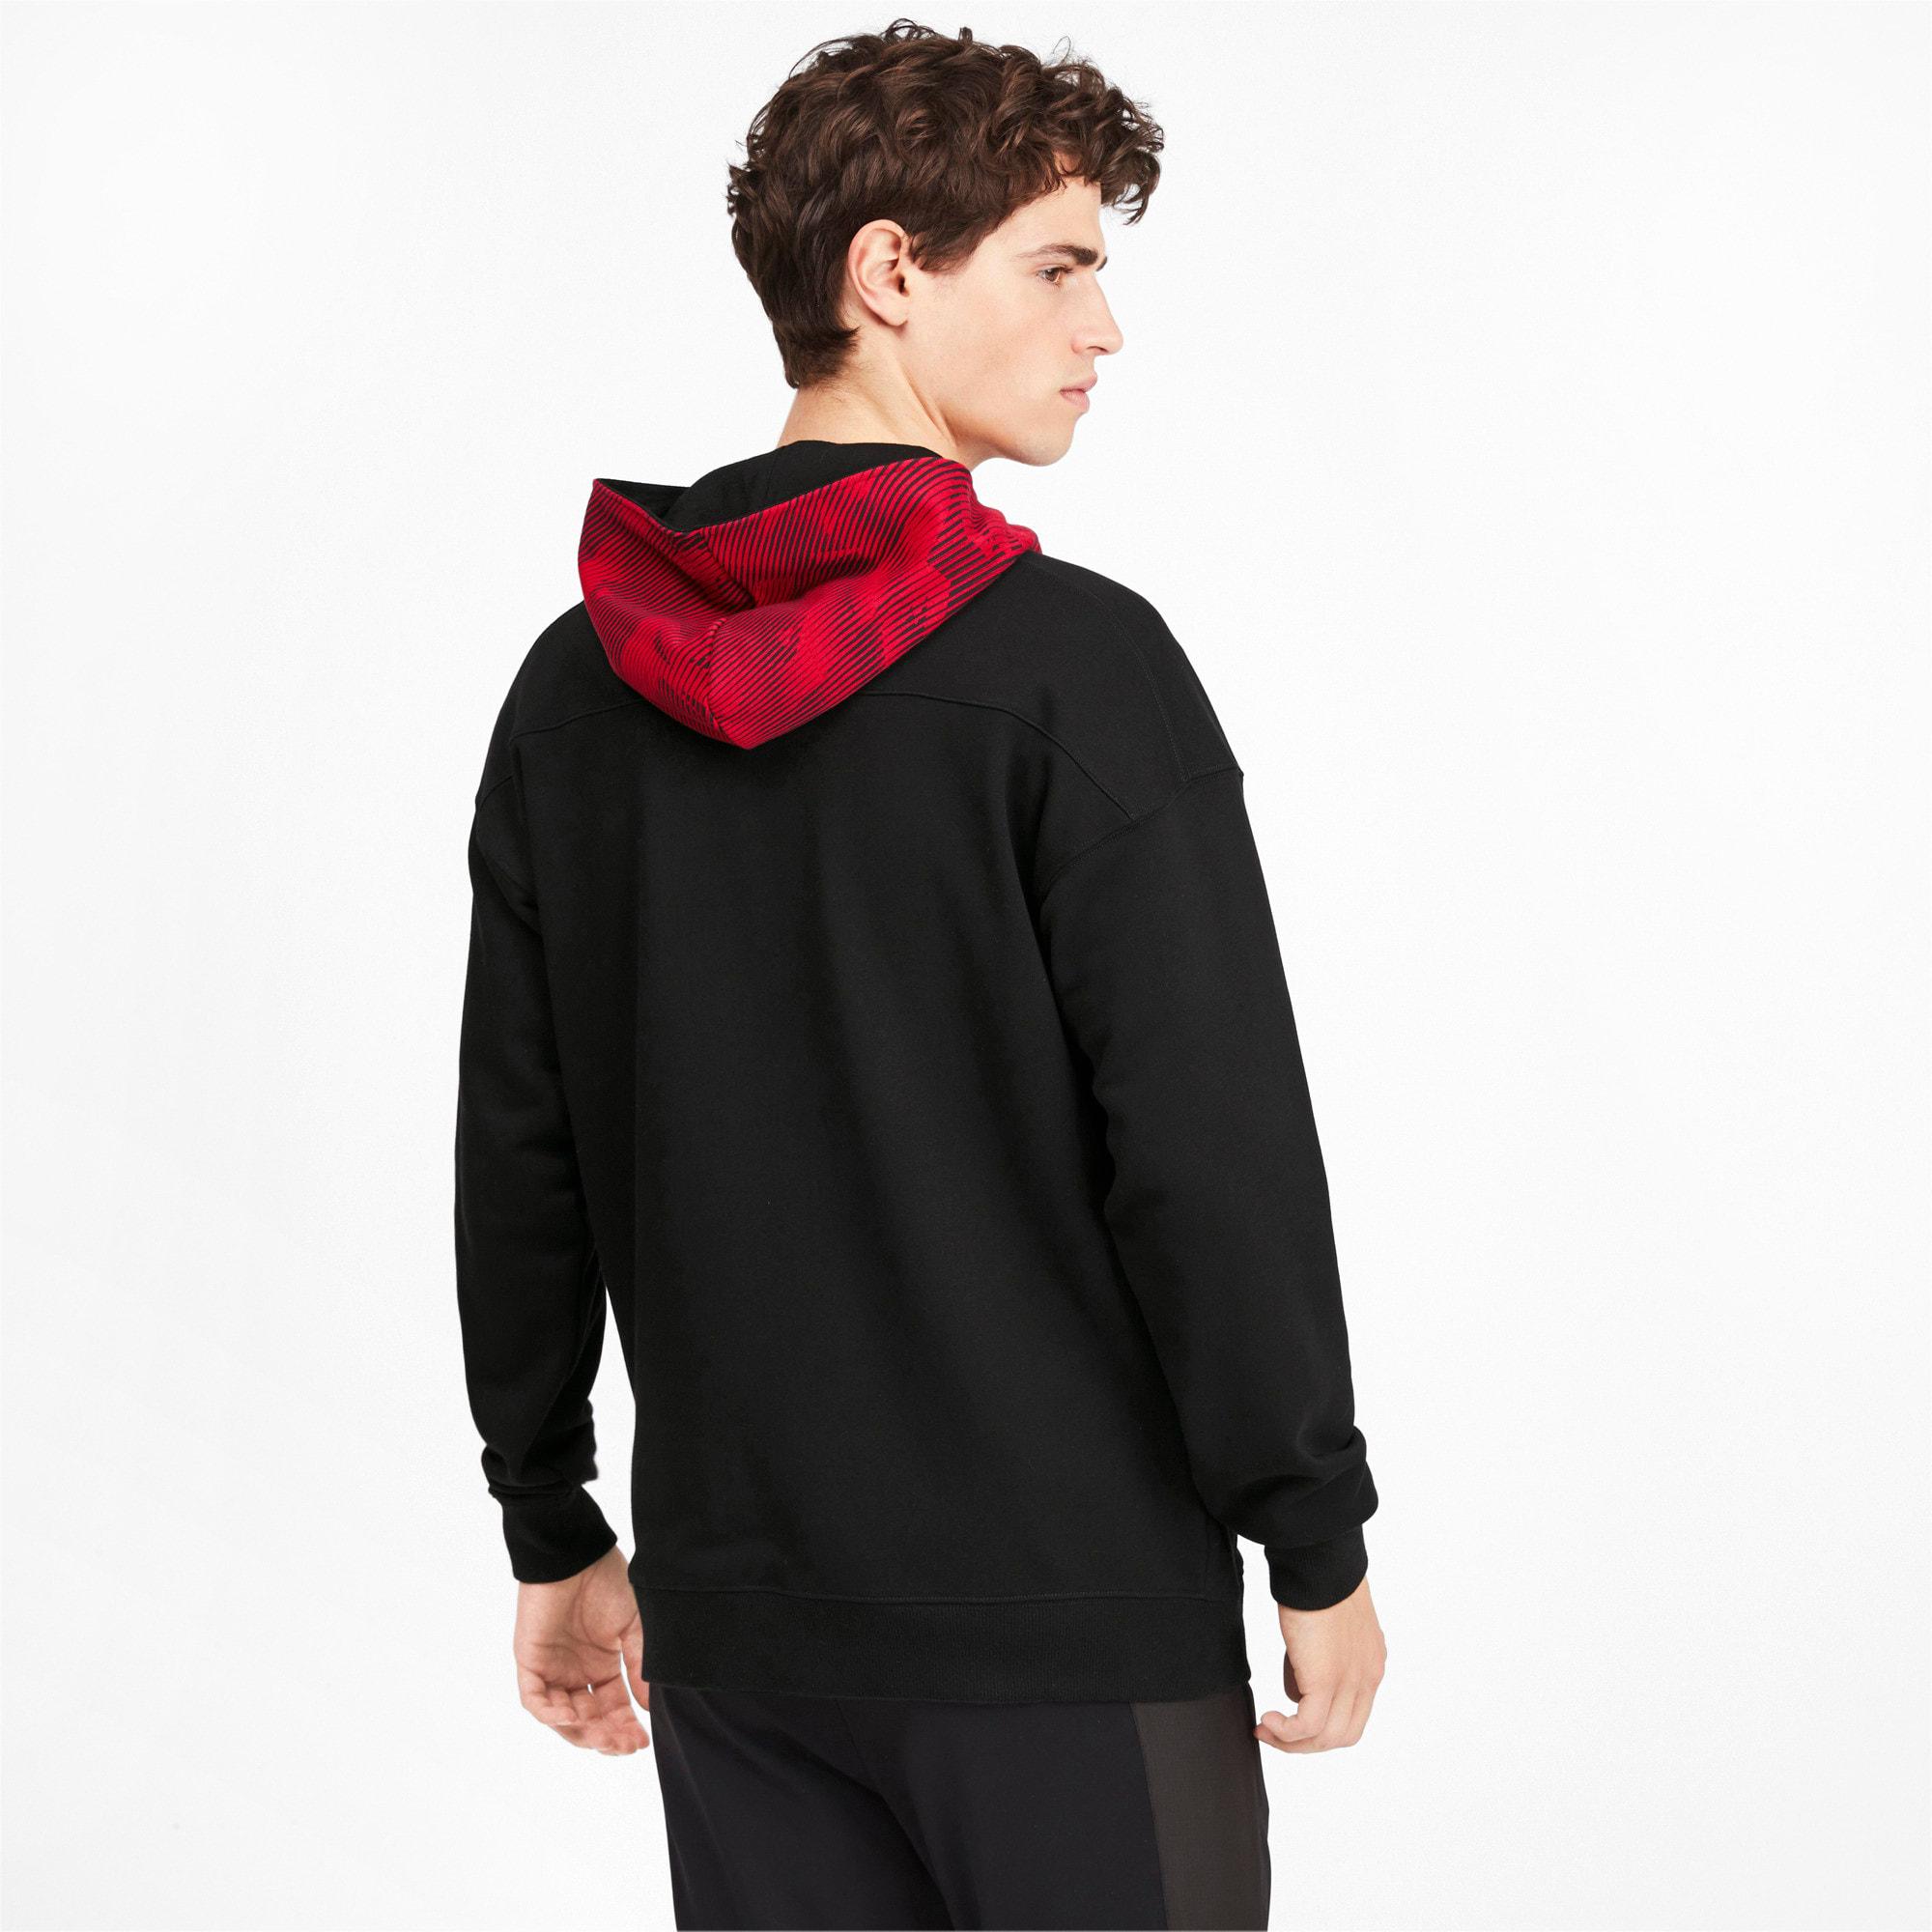 Thumbnail 2 of AC Milan Casuals Men's Hoodie, Puma Black-Tango Red, medium